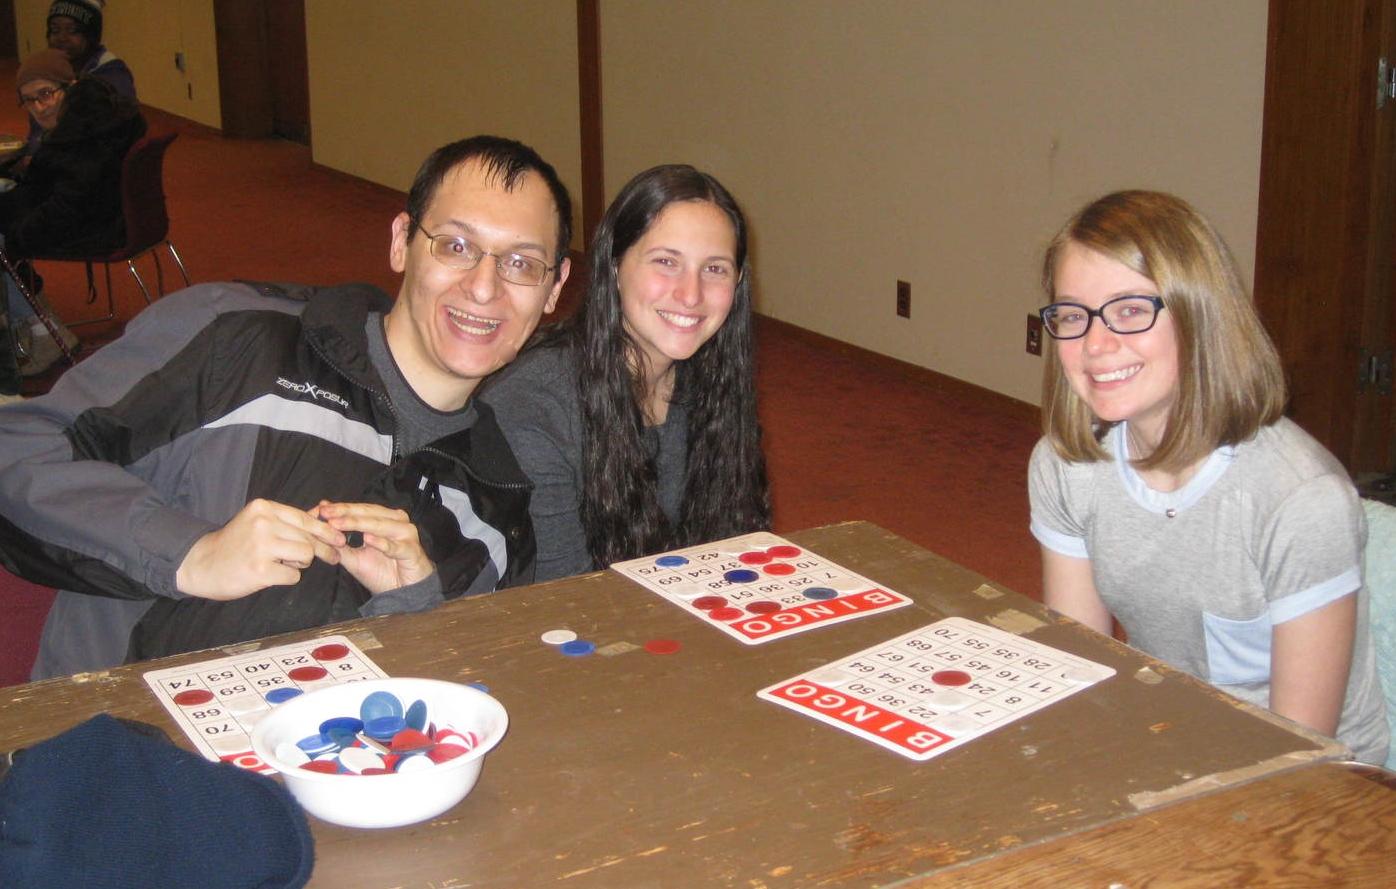 MCUSY teens volunteering at a monthly Bingo night